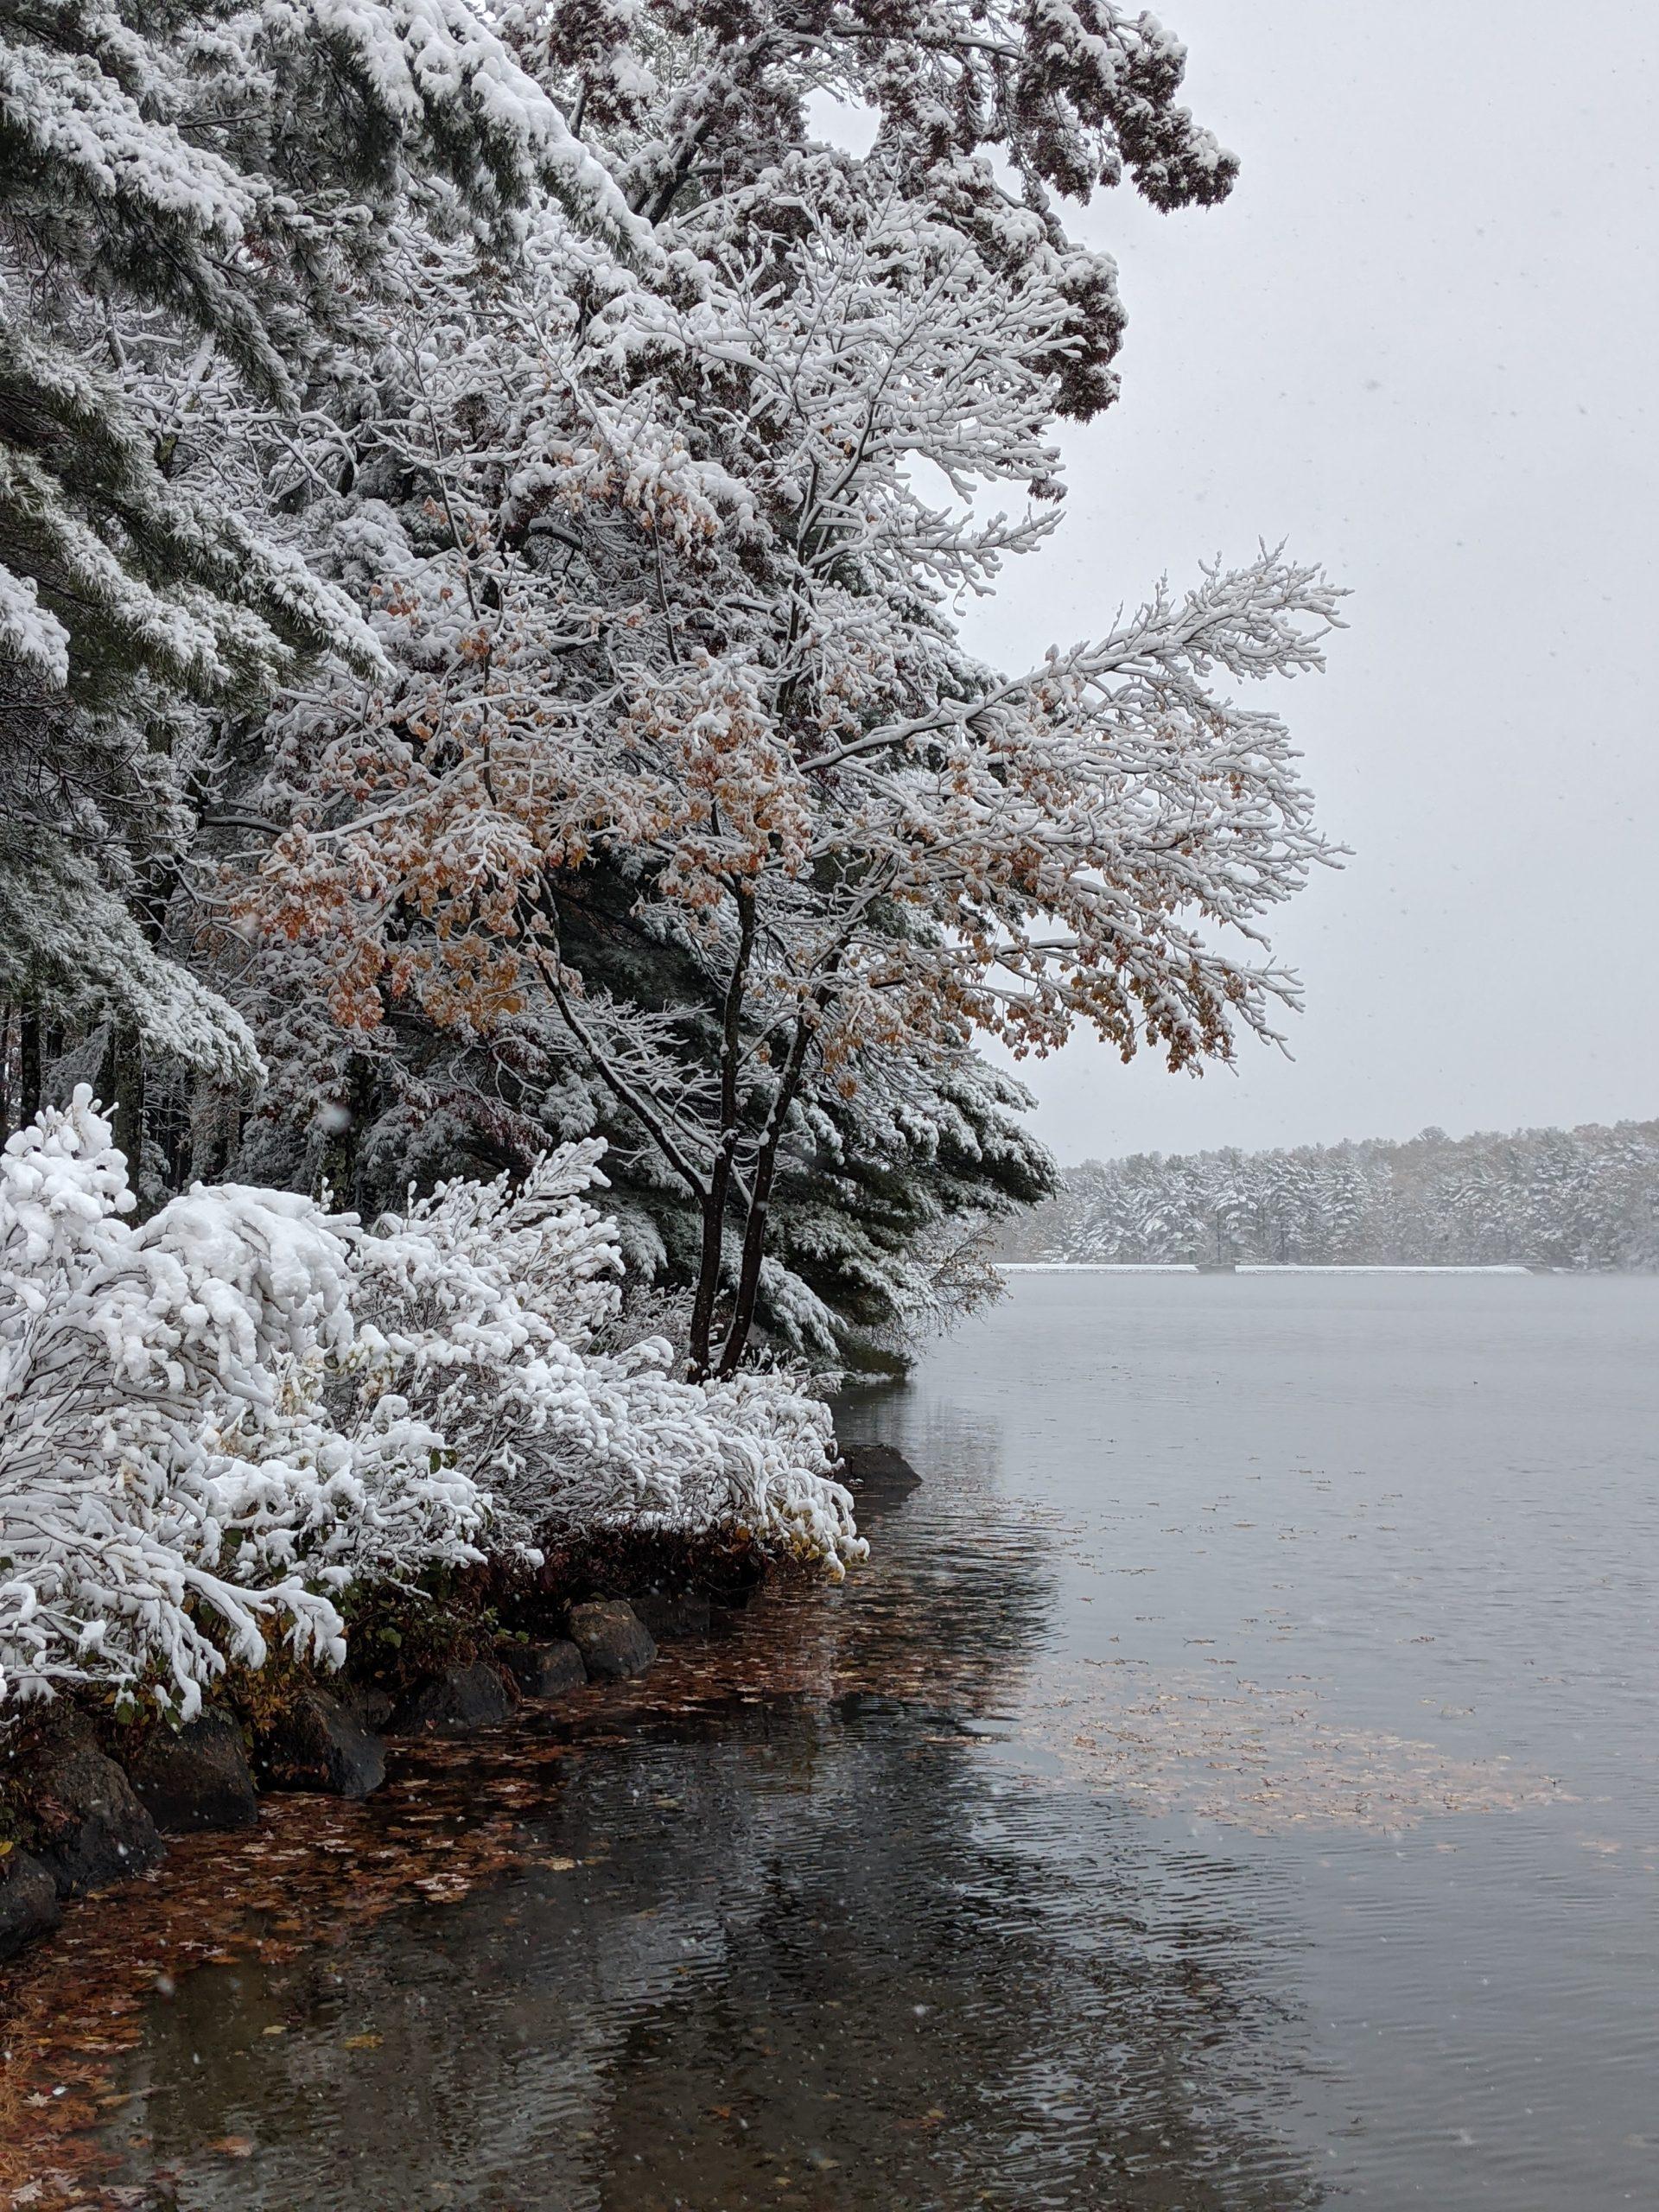 Snow coated foliage on lakeshore - October 2020